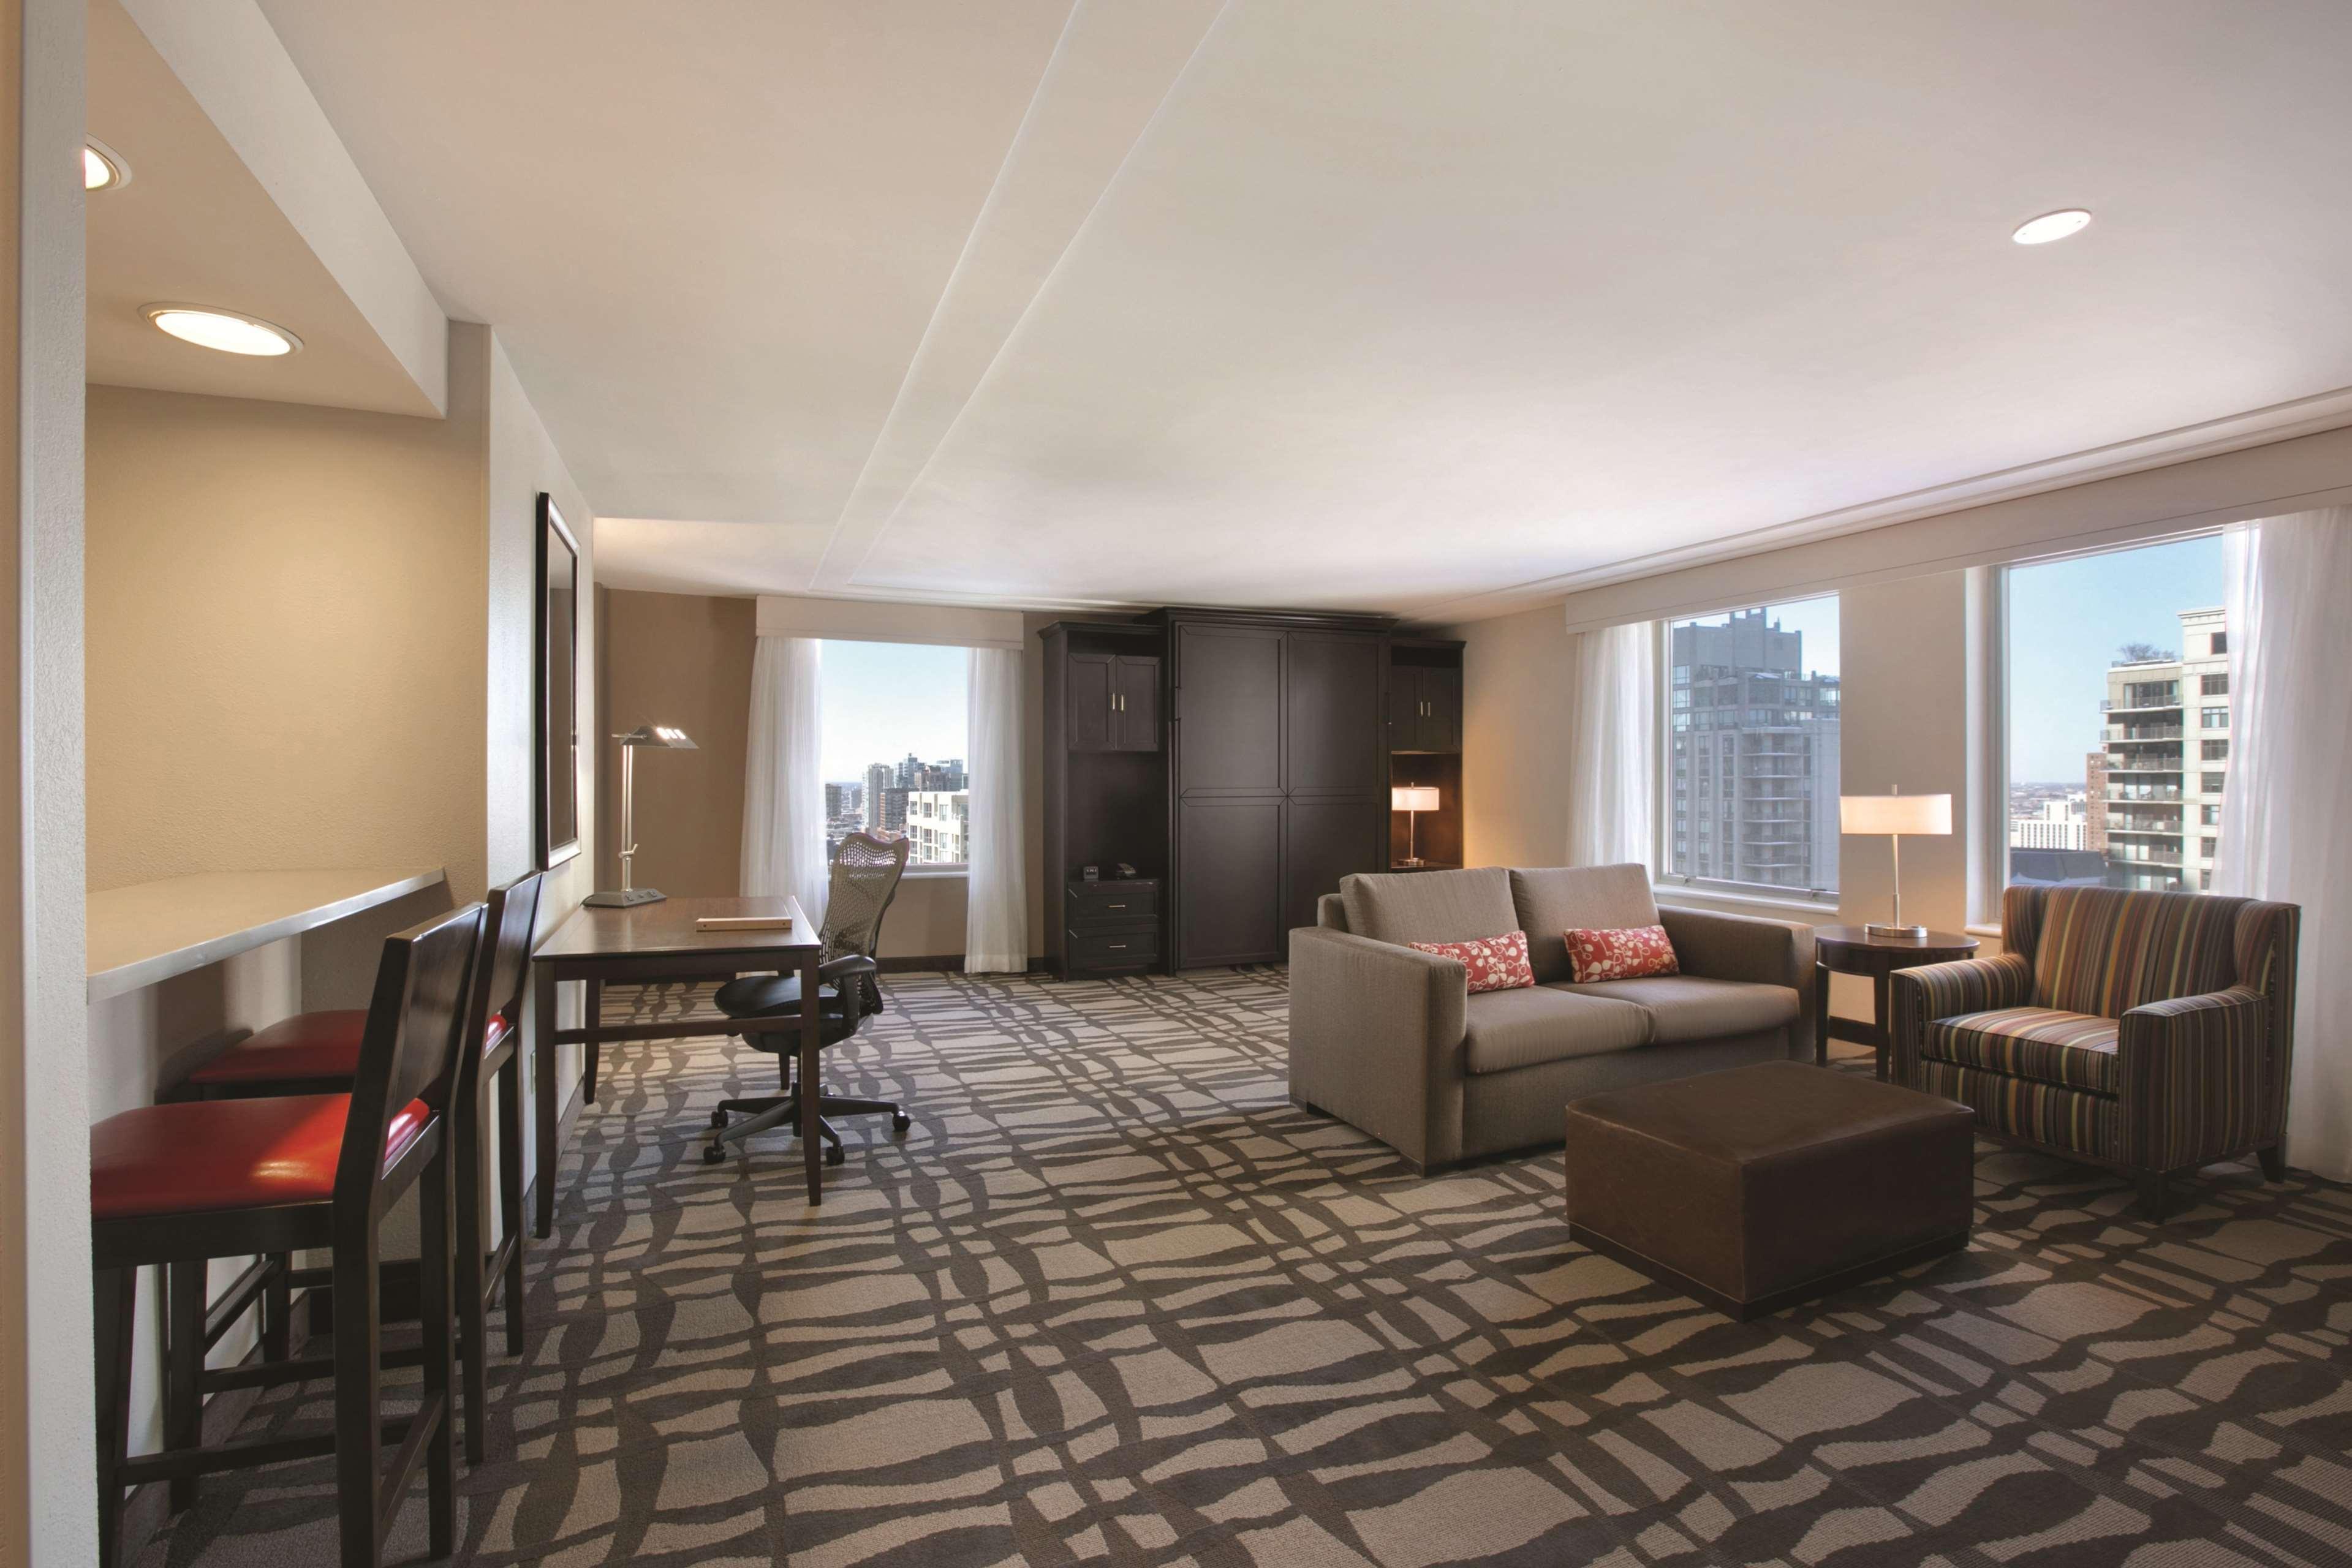 Hilton Garden Inn Chicago Downtown/Magnificent Mile image 27